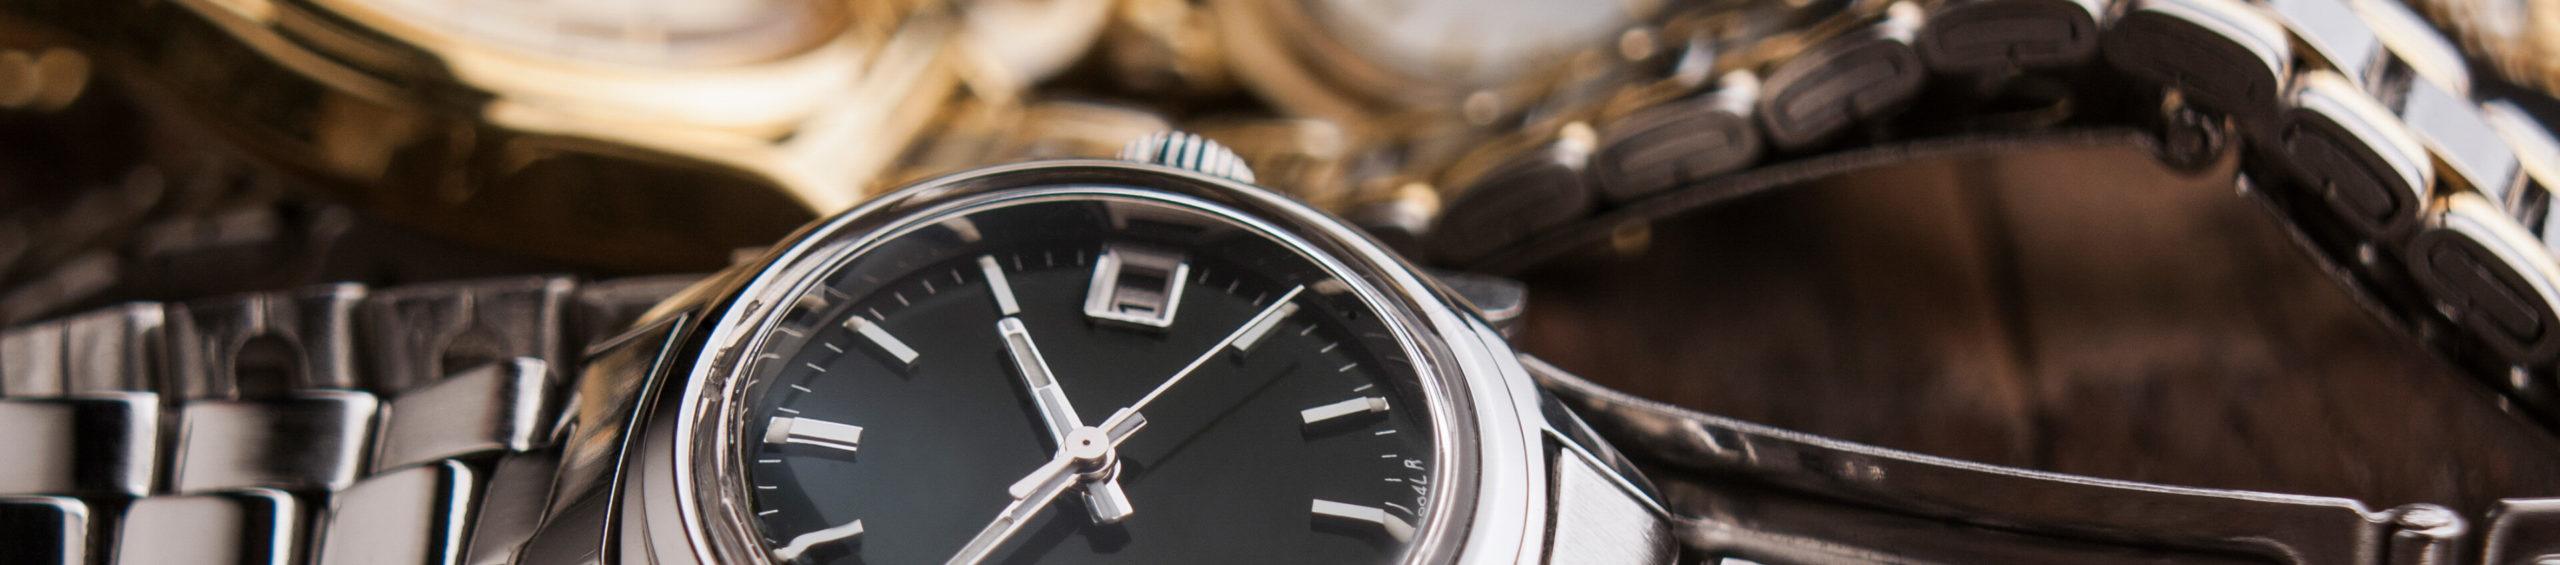 black friday horloge